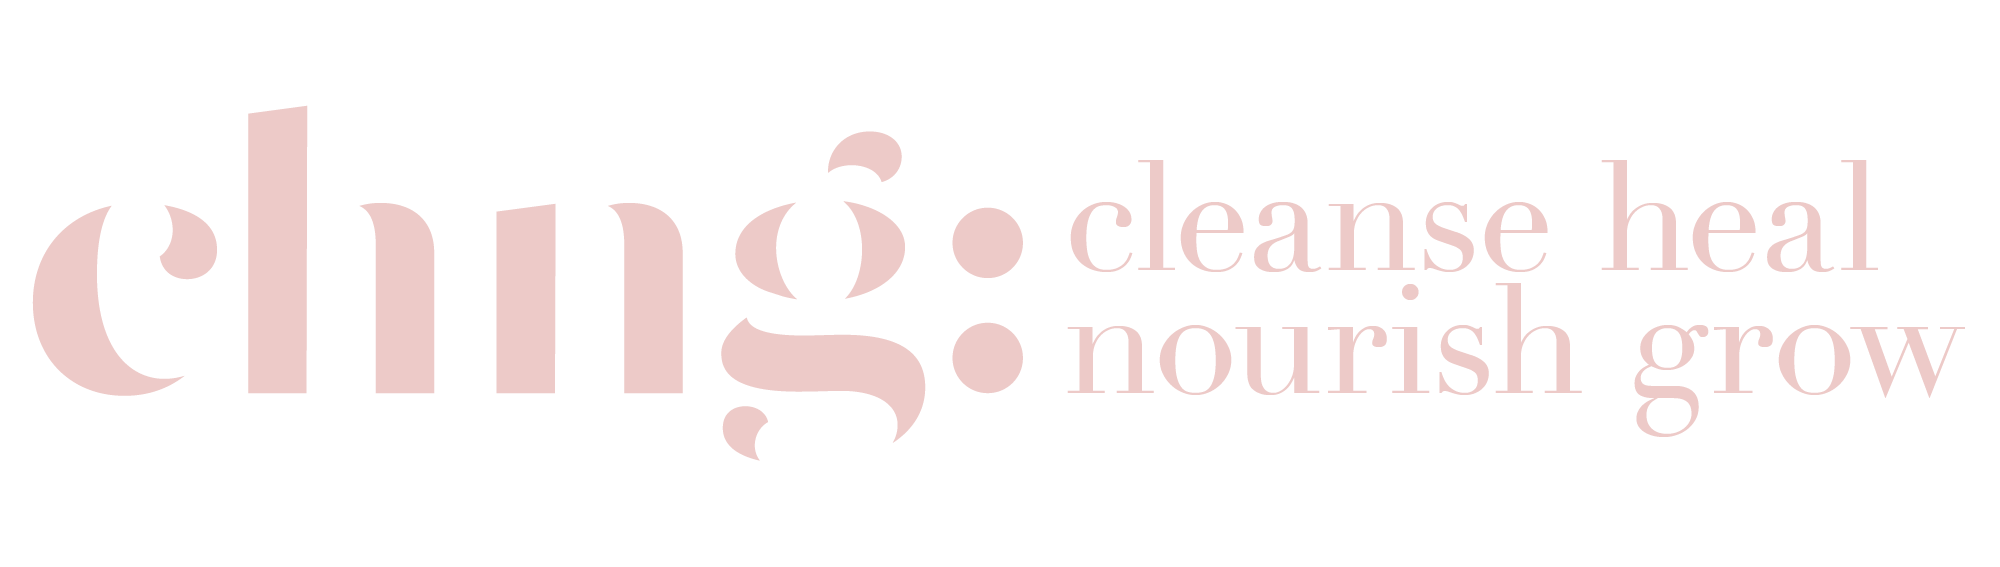 cleanse_heal_nourish_grow_logo